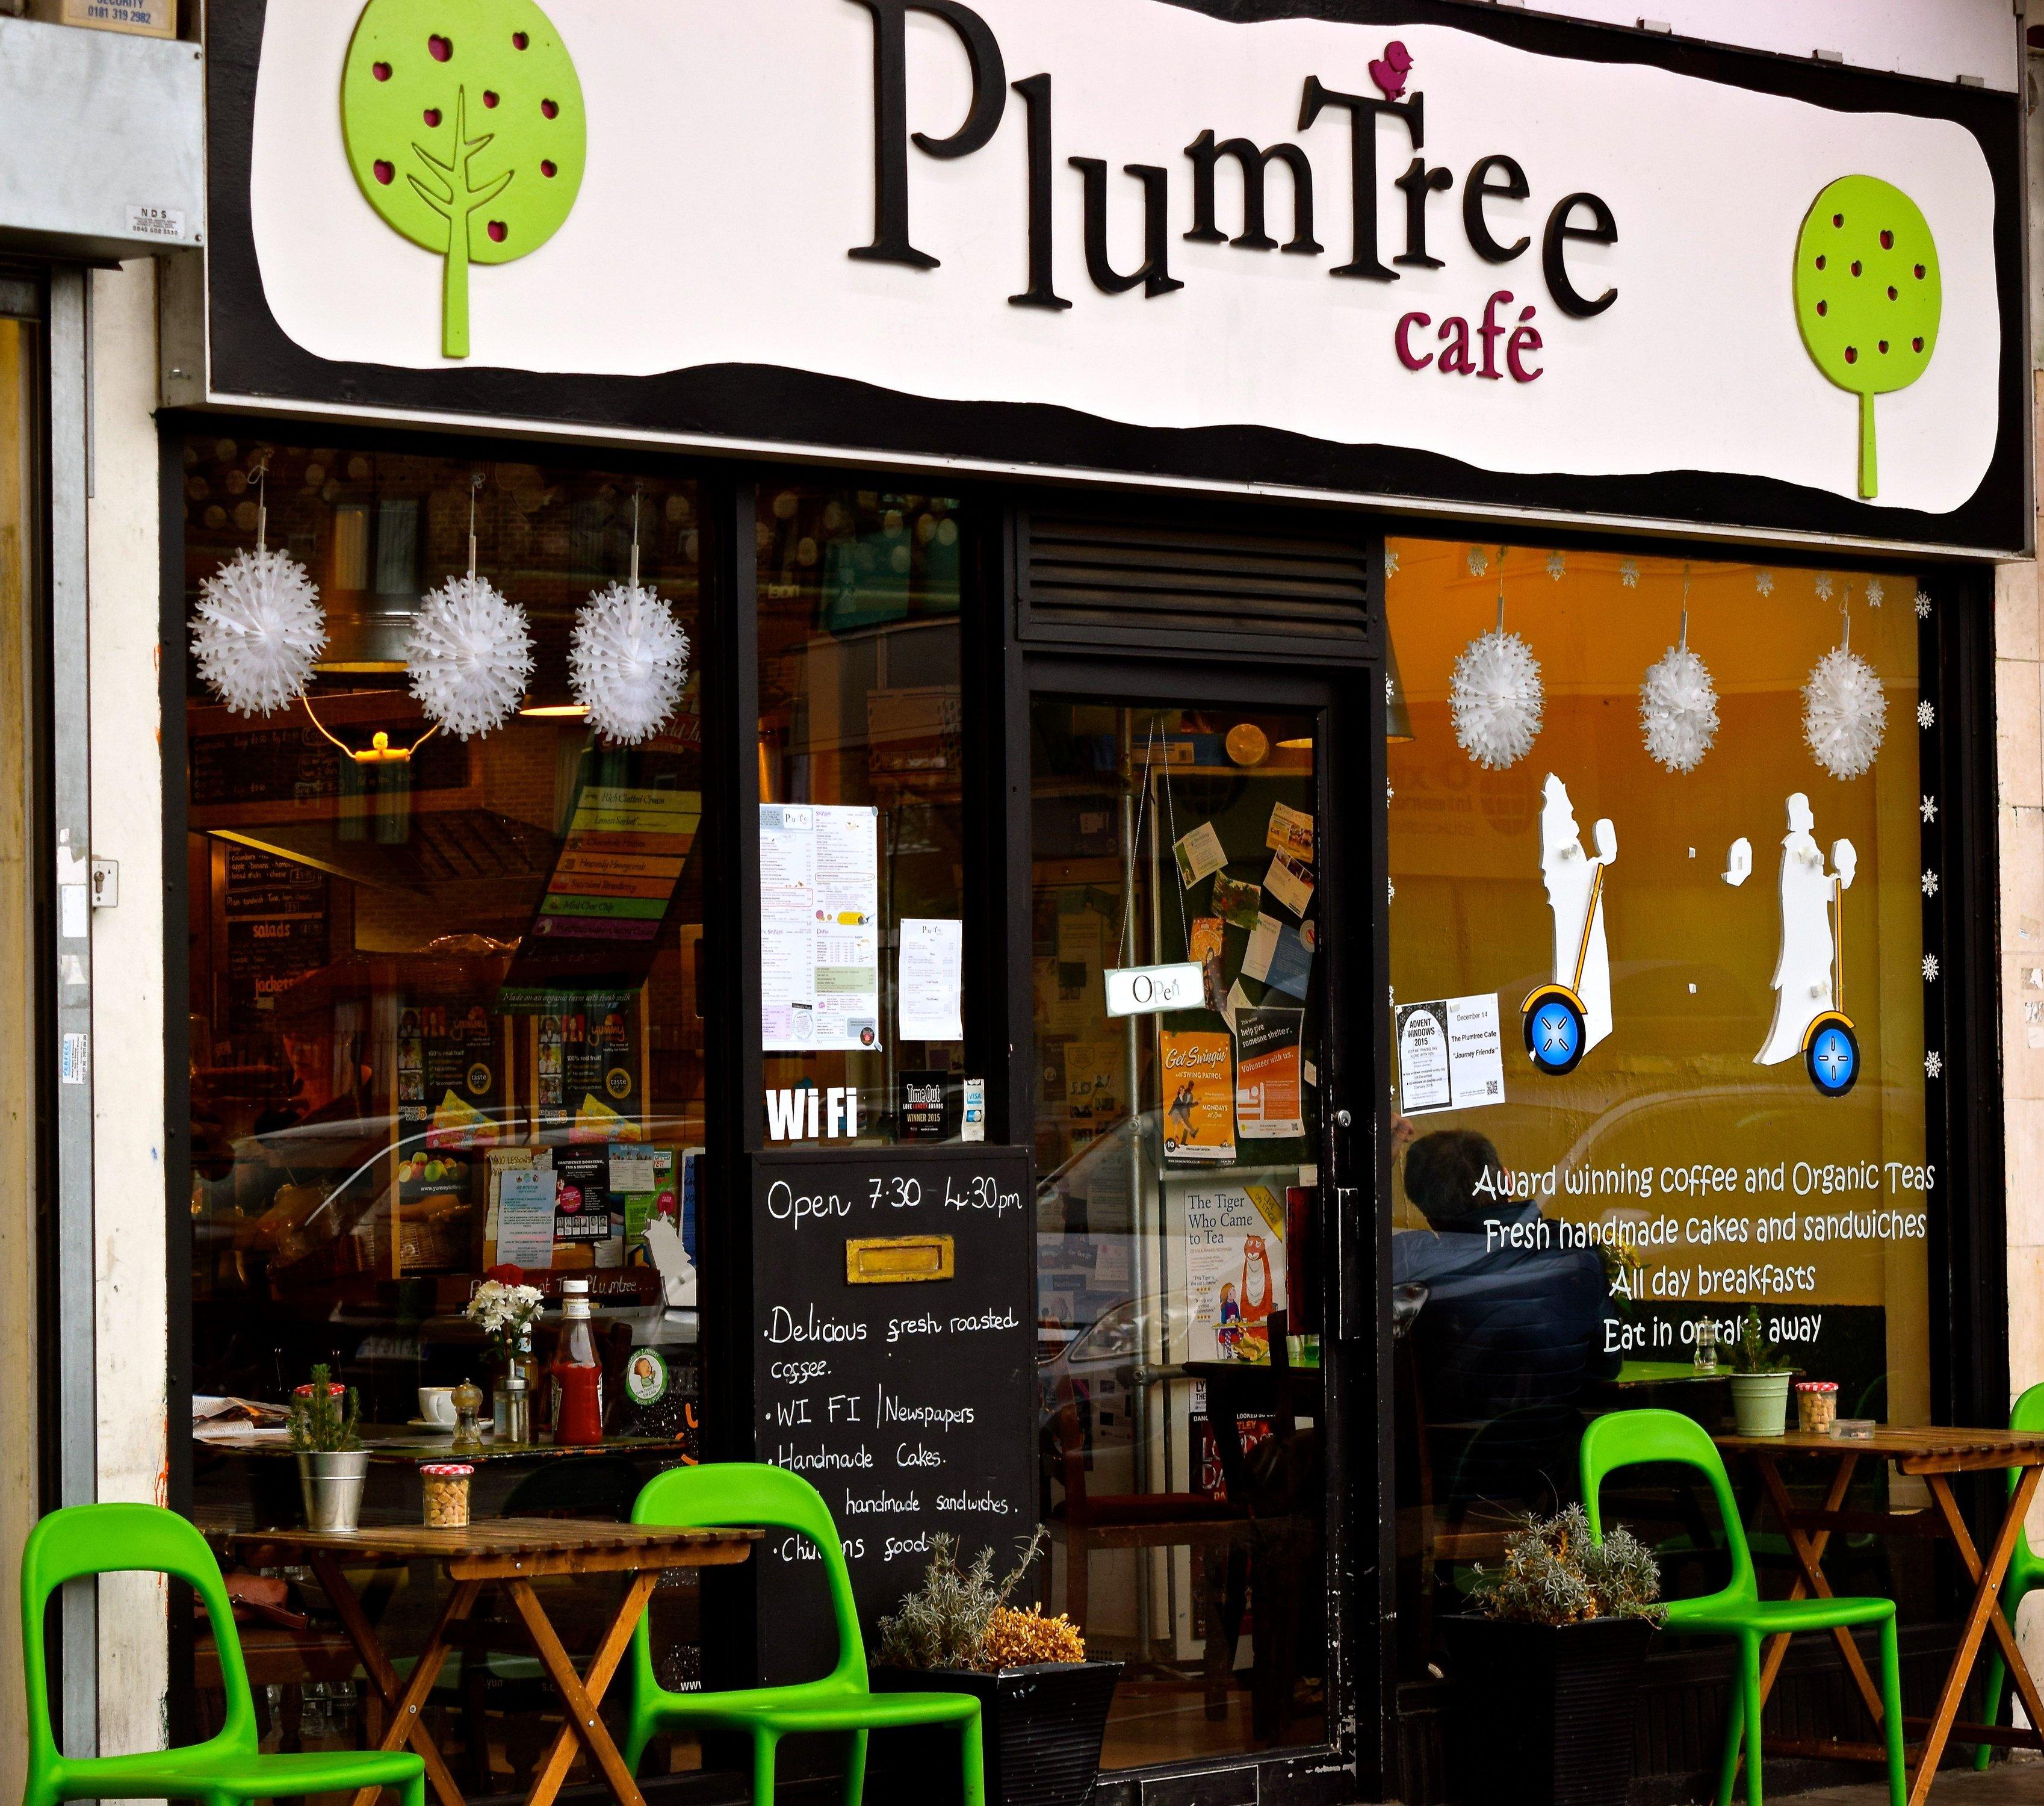 The Plumtree Cafe Menu